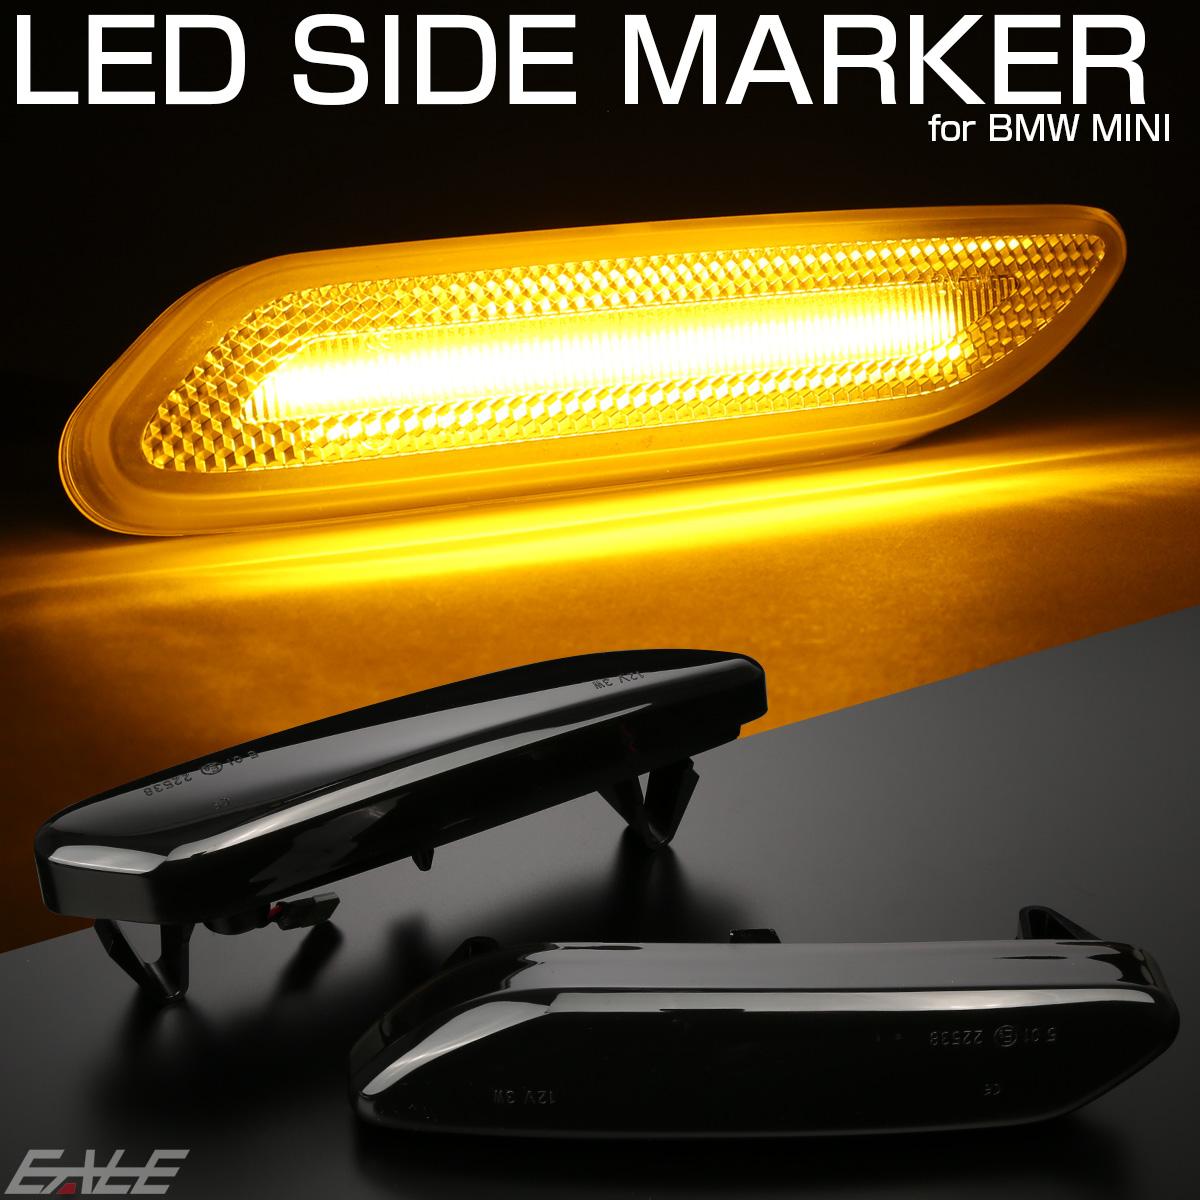 LED サイドマーカー ウインカー ミニ R60 R61 BMW MINI クロスオーバー カントリーマン ペースマン スモークレンズ F-559